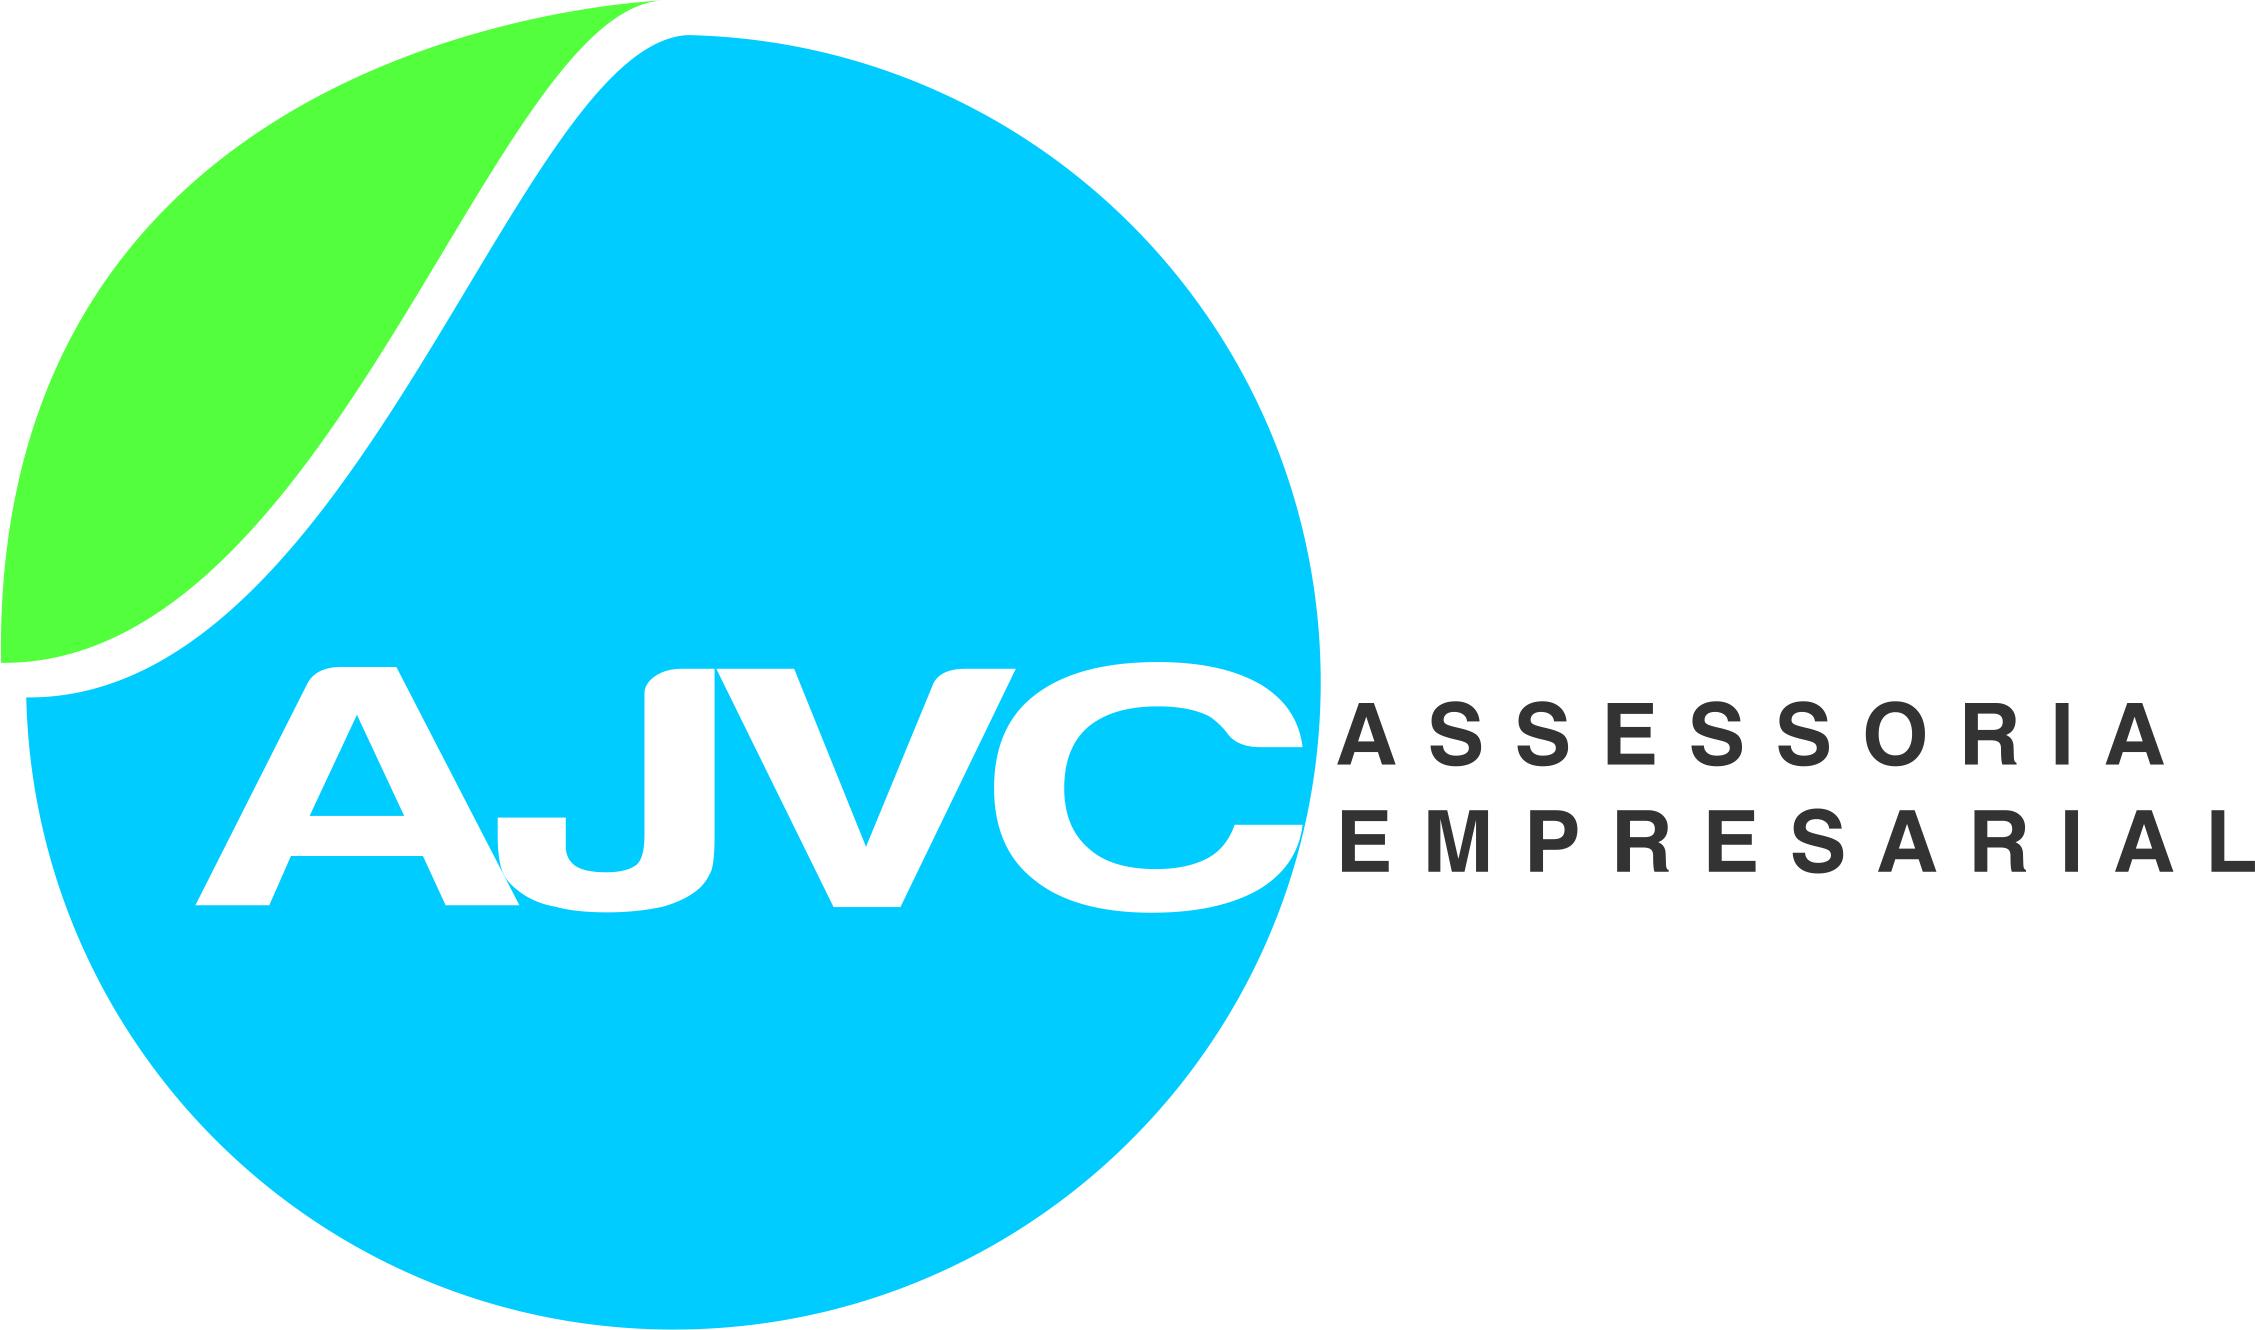 AJVC Assessoria Empresarial